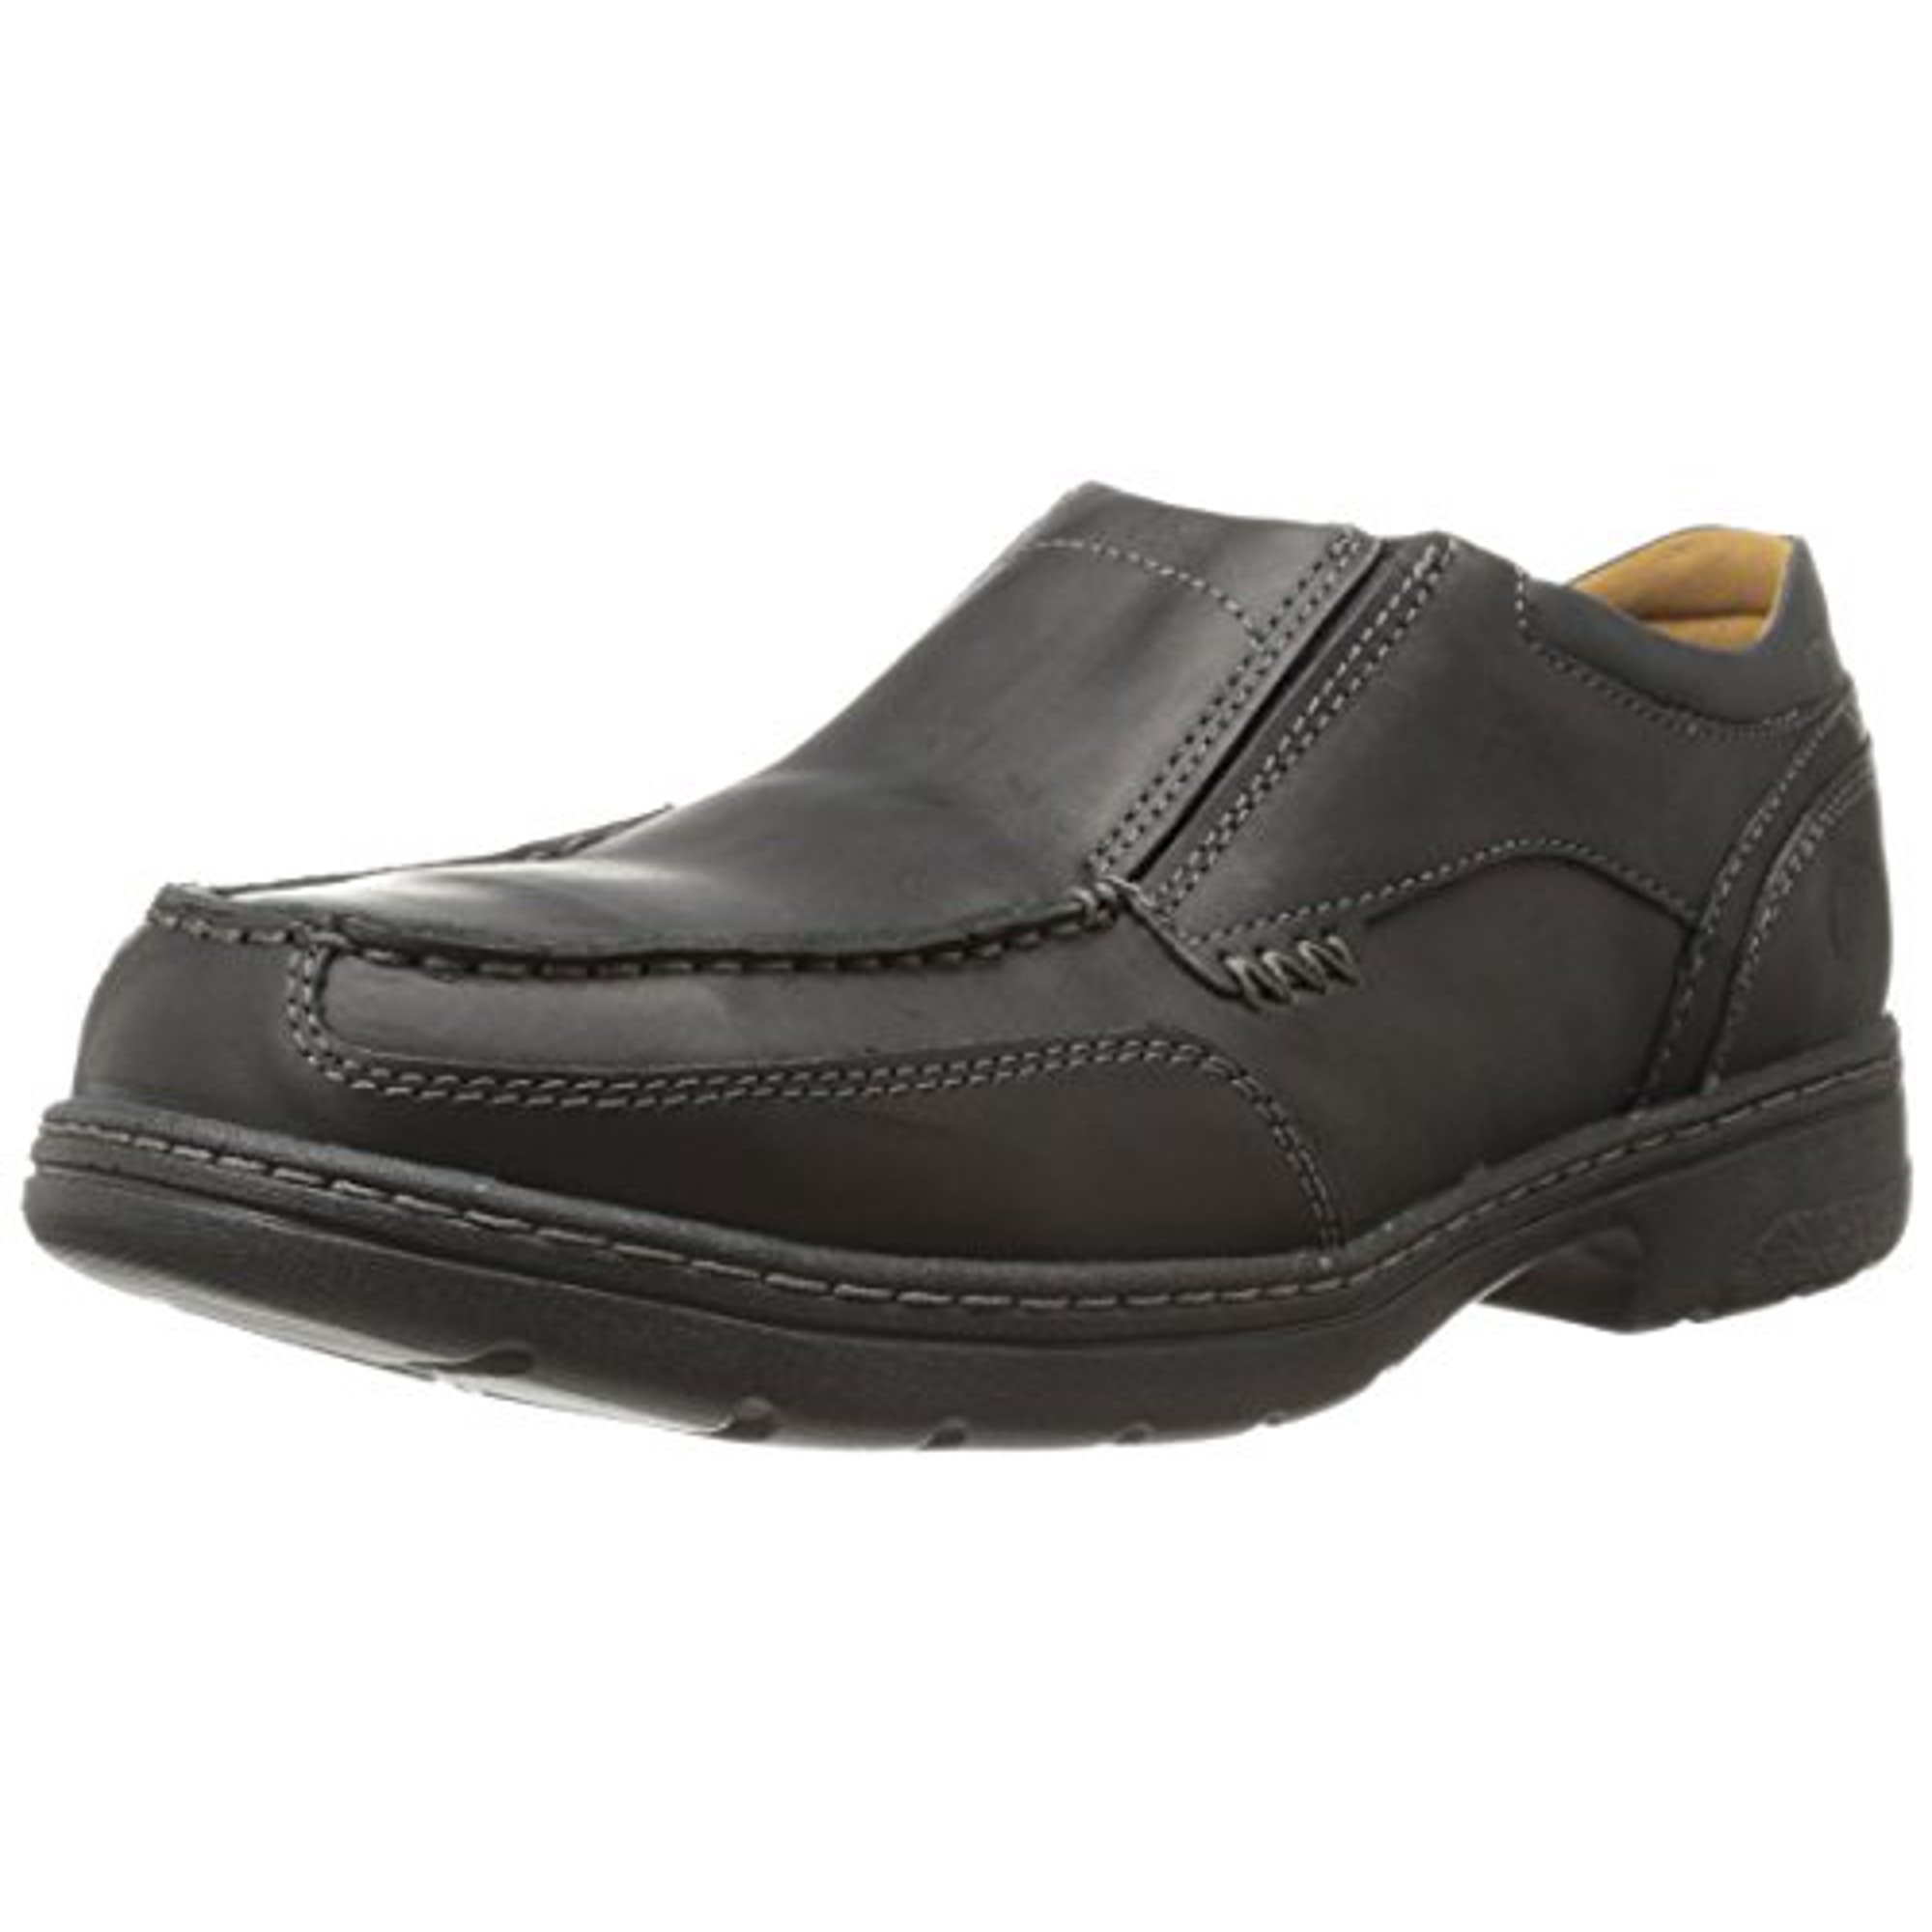 ab07692f7c36 Buy Men s Timberland PRO Branston Alloy Safety Toe Moc Toe Slip-On ...